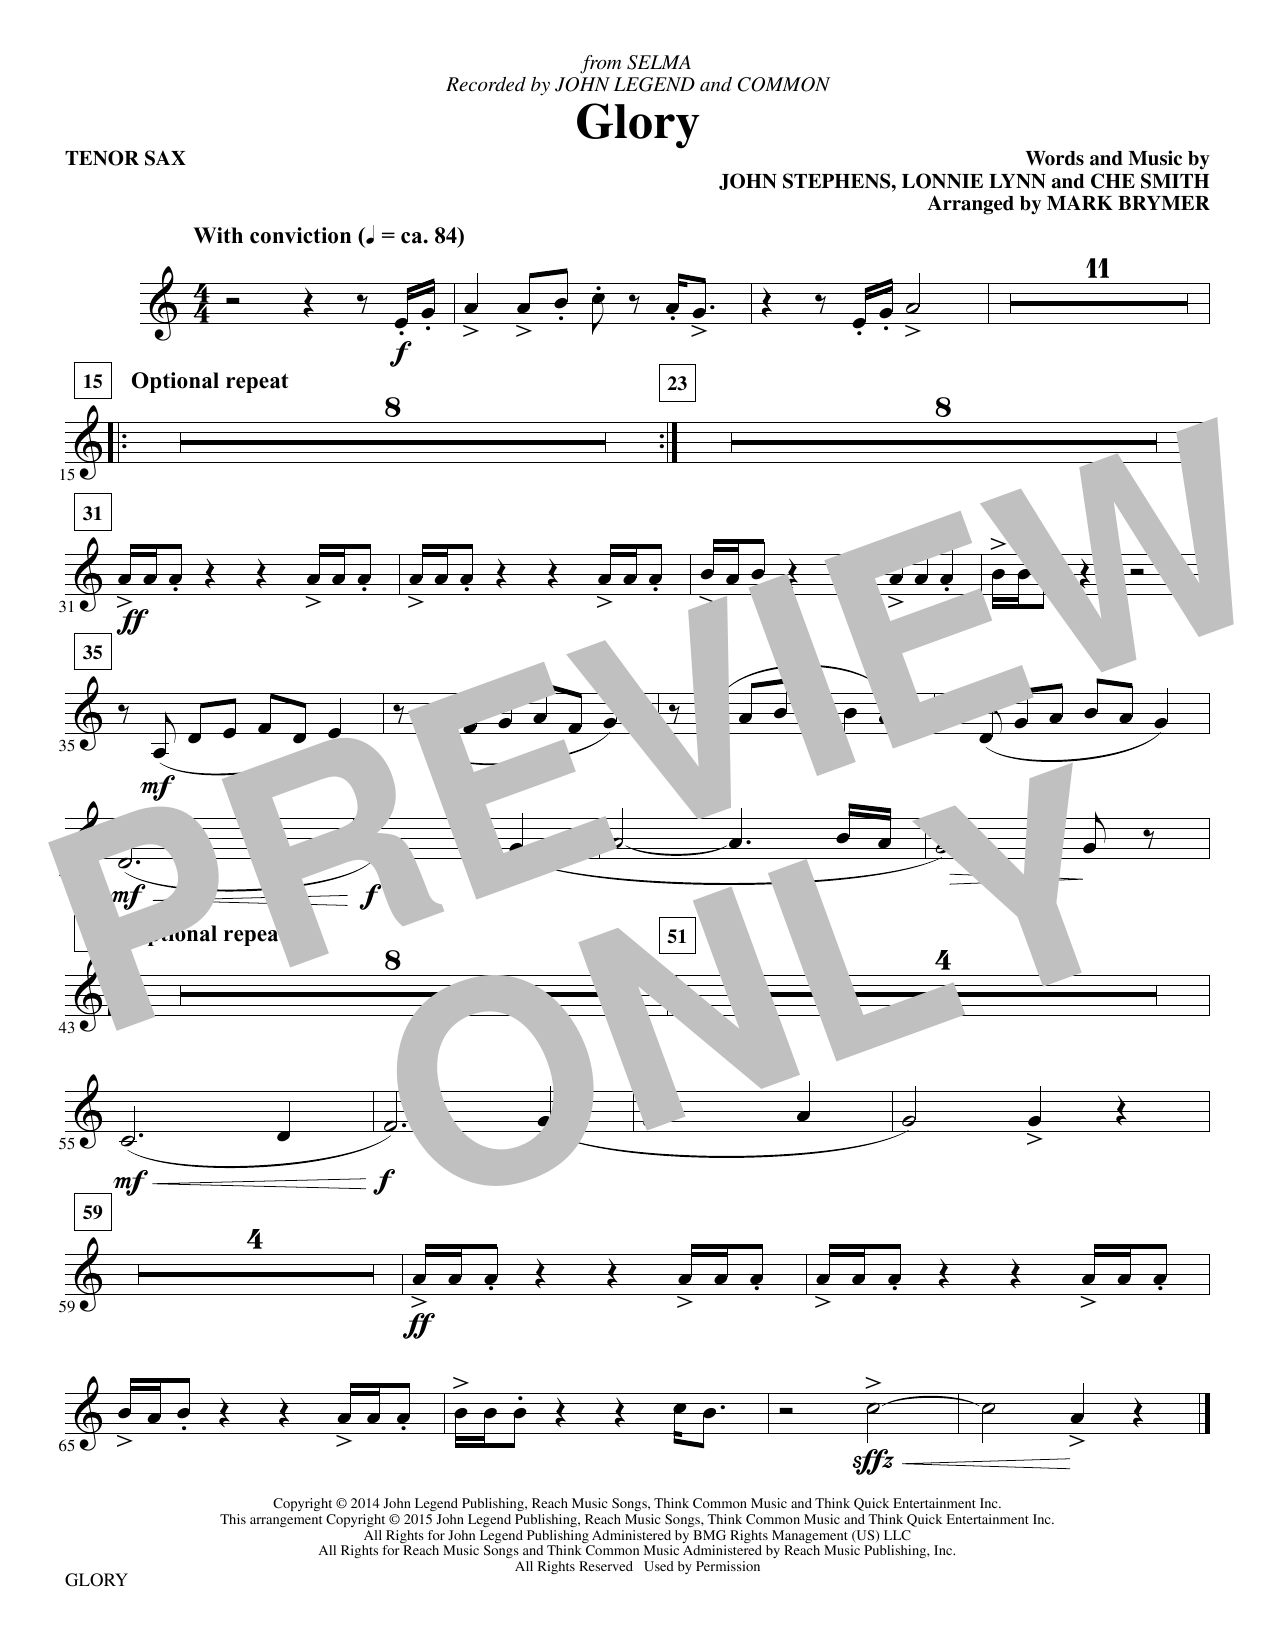 Glory - Tenor Saxophone sheet music